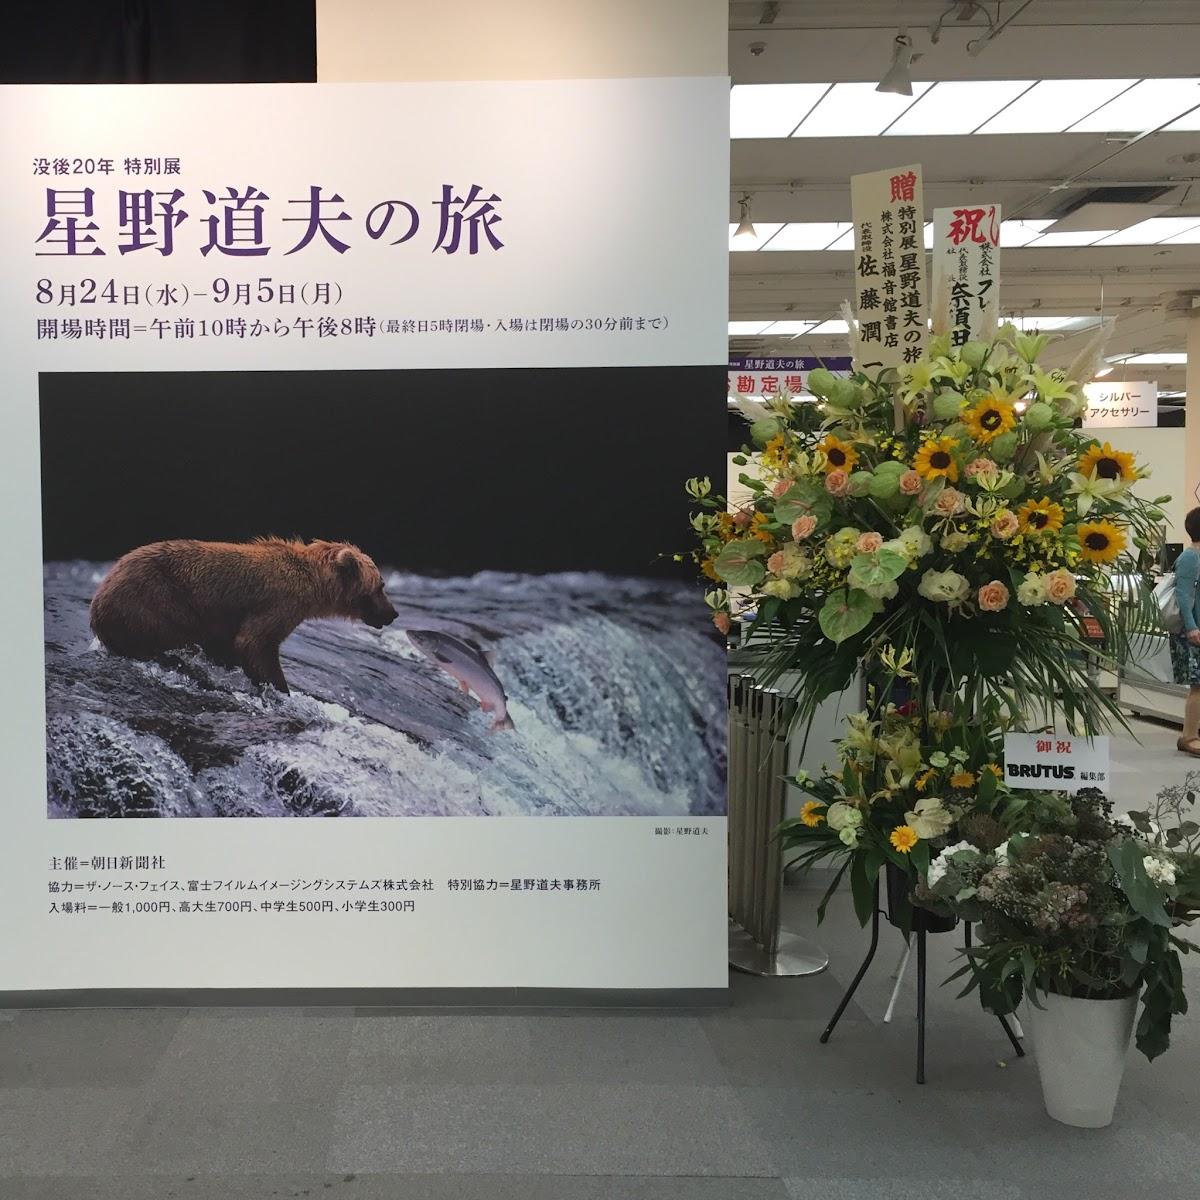 没後20年 特別展 星野道夫の旅 | 松屋銀座 | 2016-08 【鑑賞メモ】